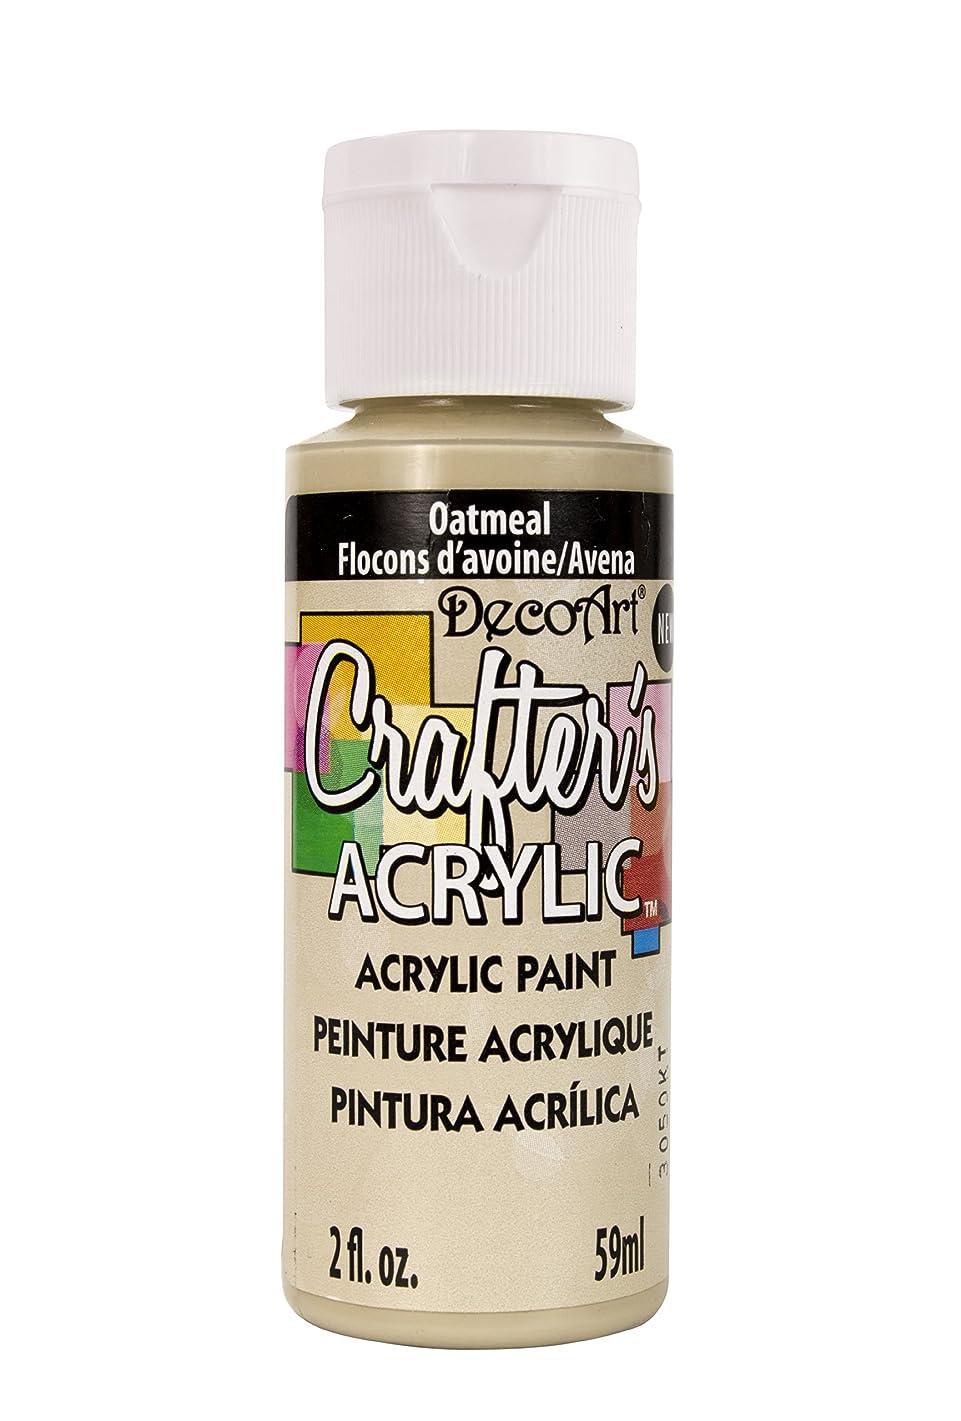 DecoArt DCA138-3 Crafter's Acrylic Paint, 2-Ounce, Oatmeal